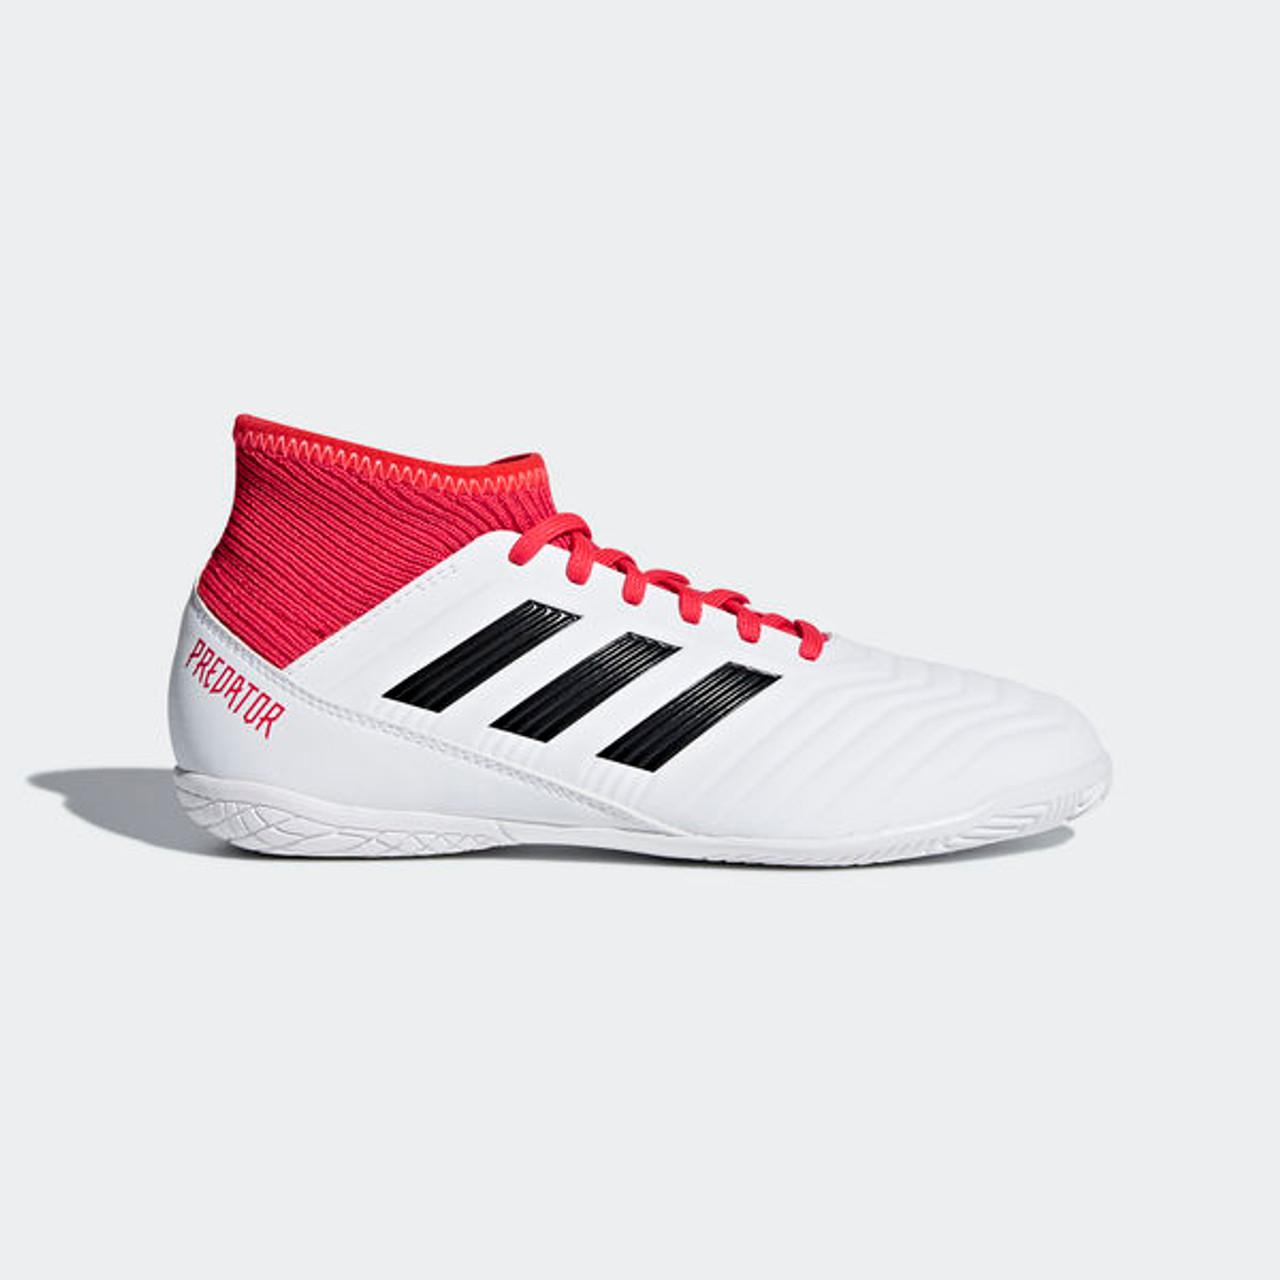 ADIDAS JR PREDATOR TANGO 18.3 Indoor Shoes Whitereal coral